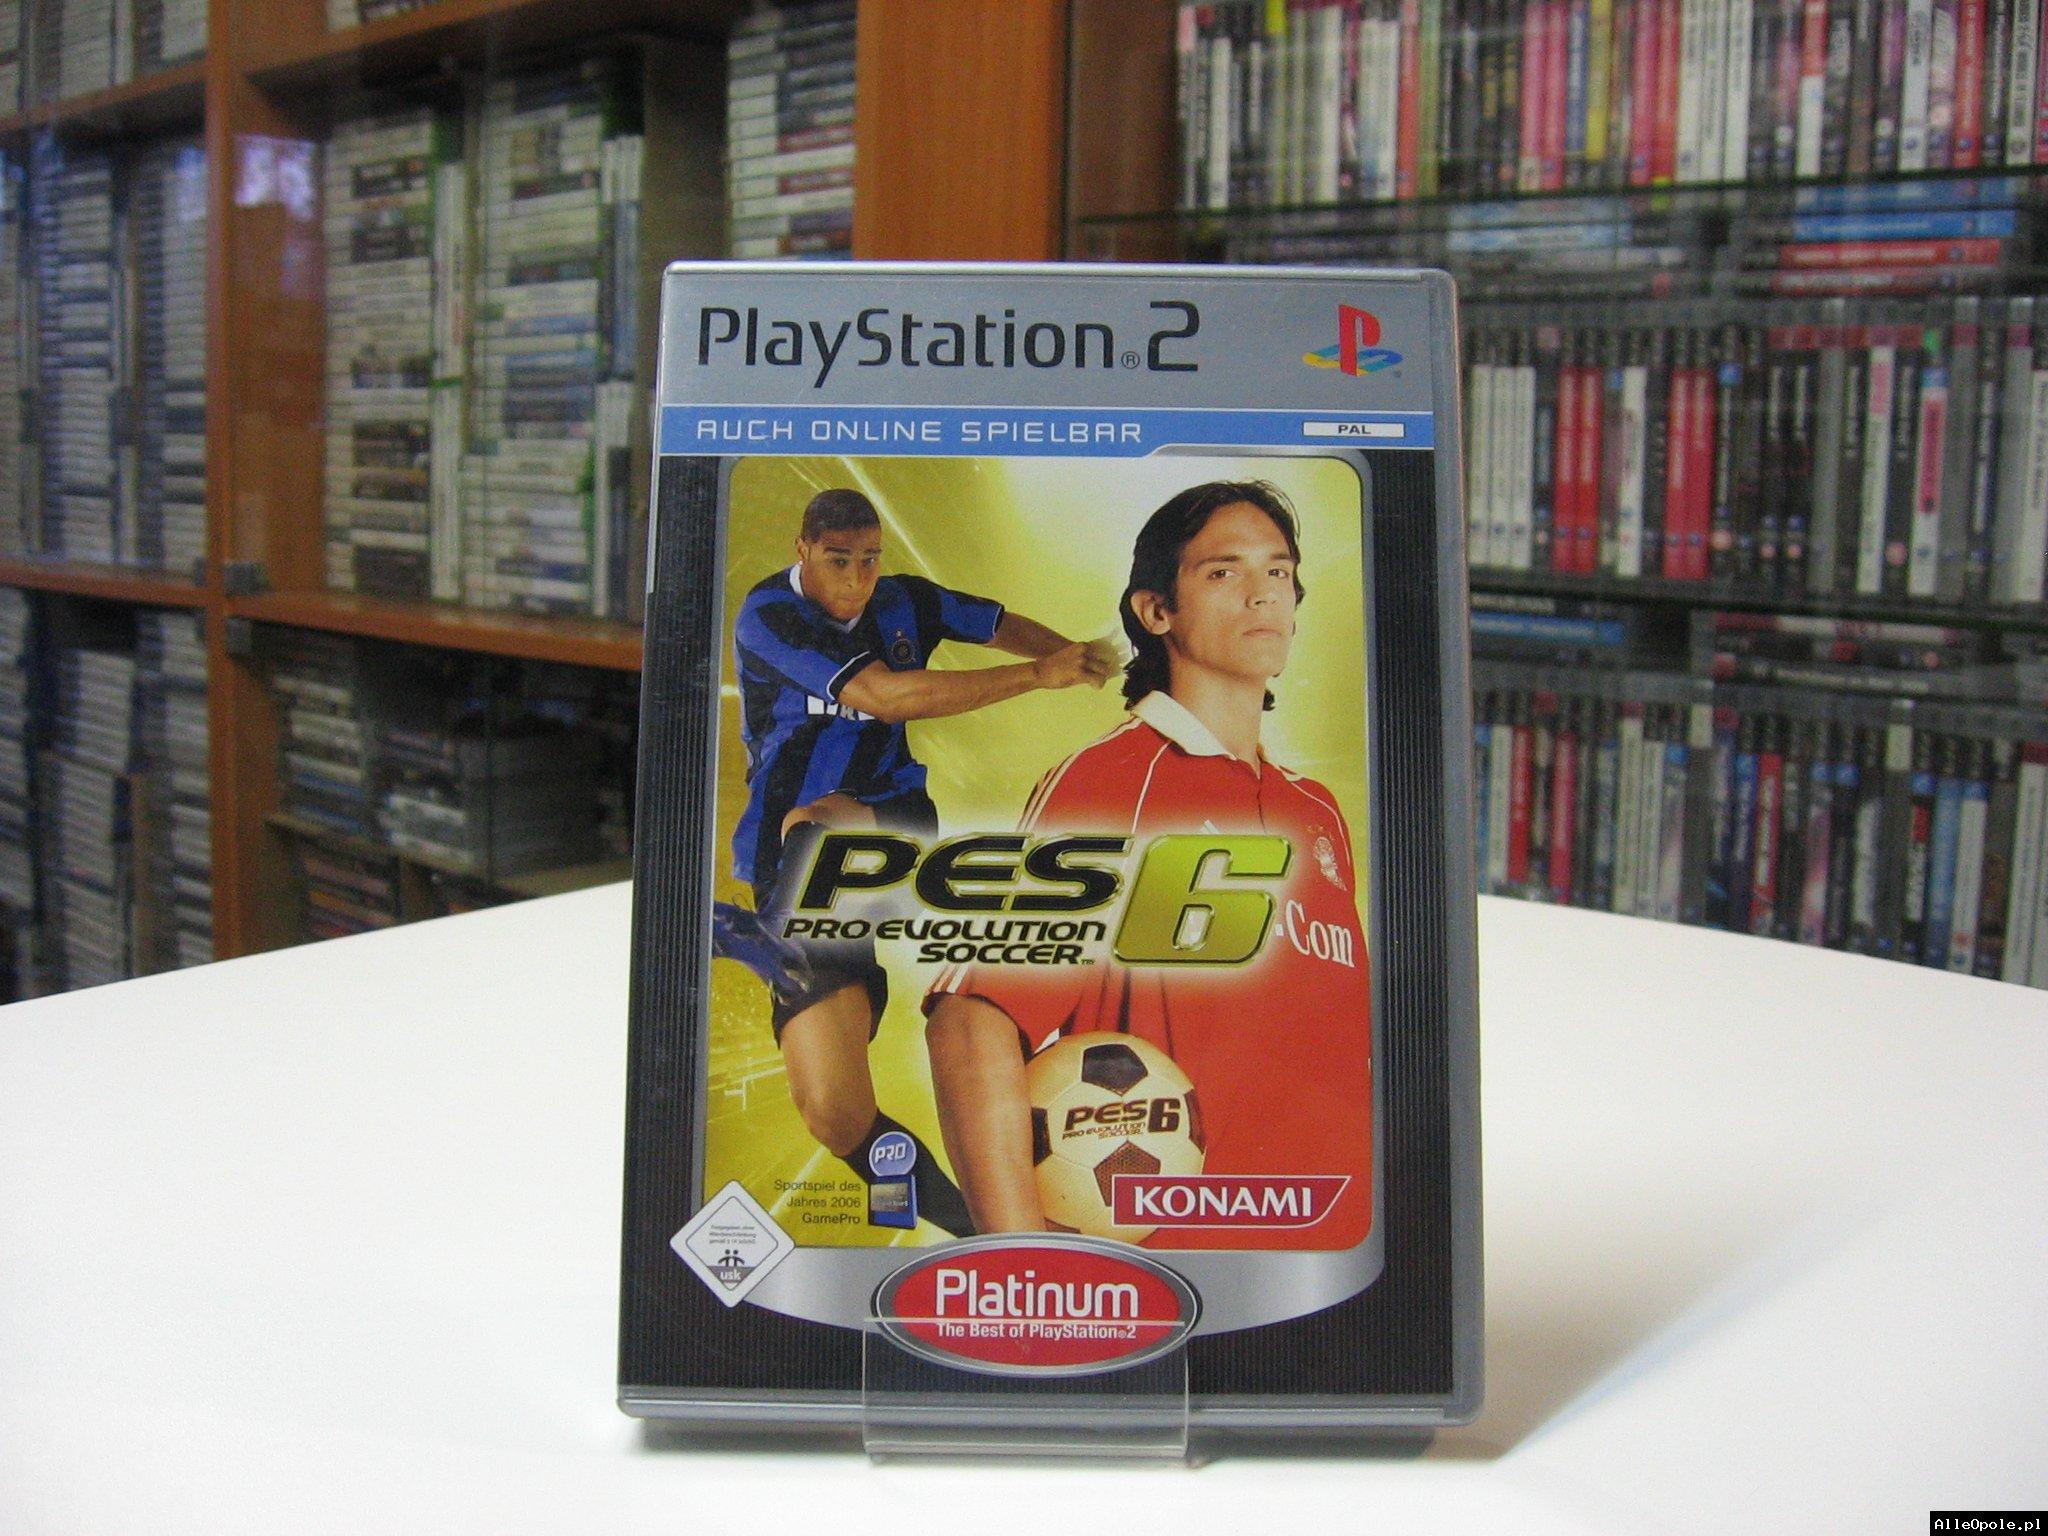 PES 6 Pro Evolution Soccer 6 - GRA Ps2 - Opole 0566